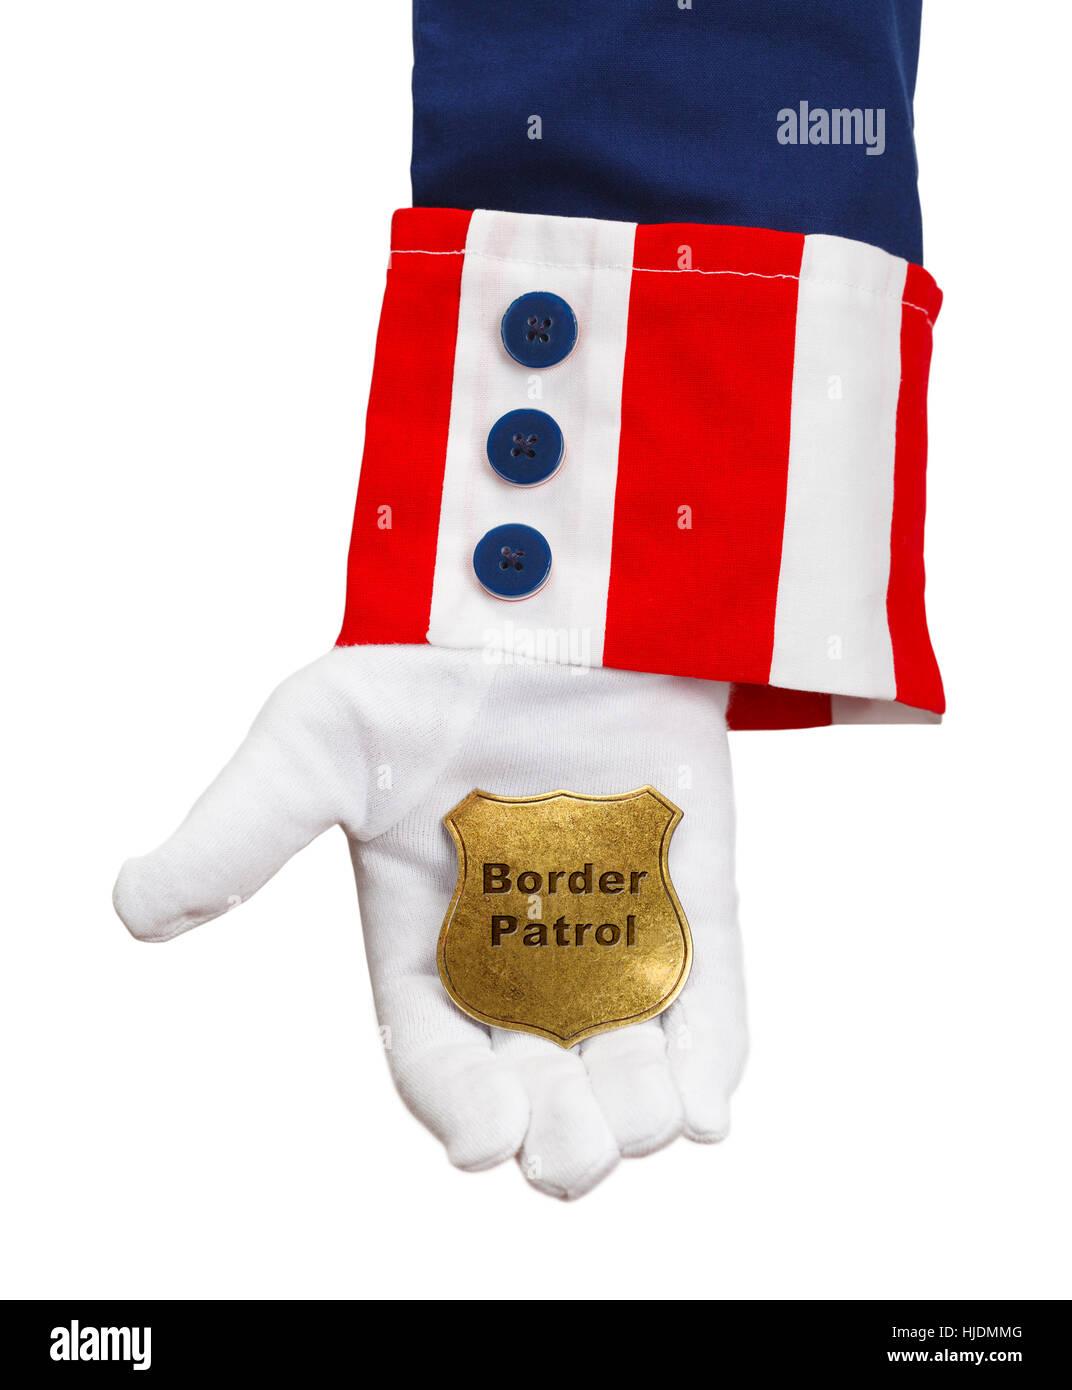 President Holding Border Patrol Badge Isolated on White. - Stock Image